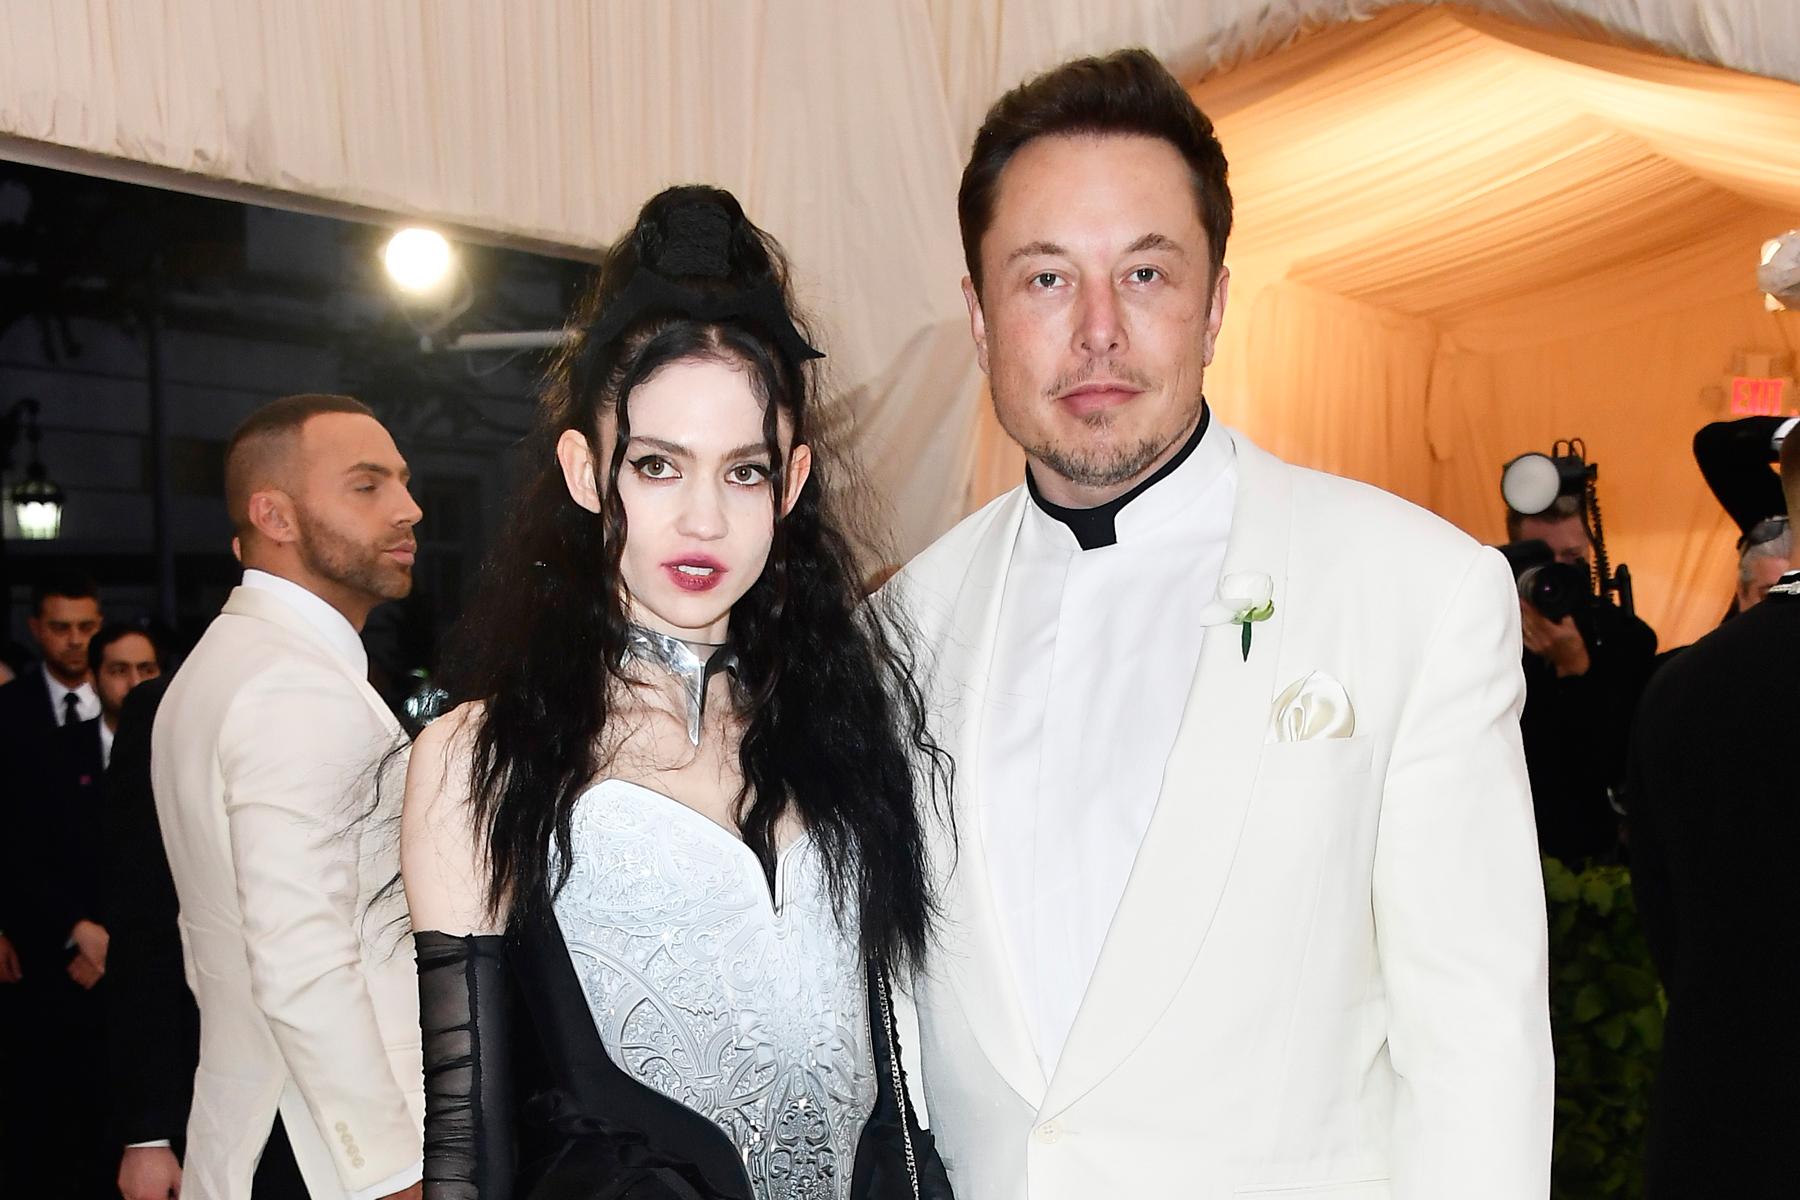 Azealia Banks Elated Over Grimes, Elon Musk Breakup: 'We Can Finally Make Those Darn Songs' - Rolling Stone